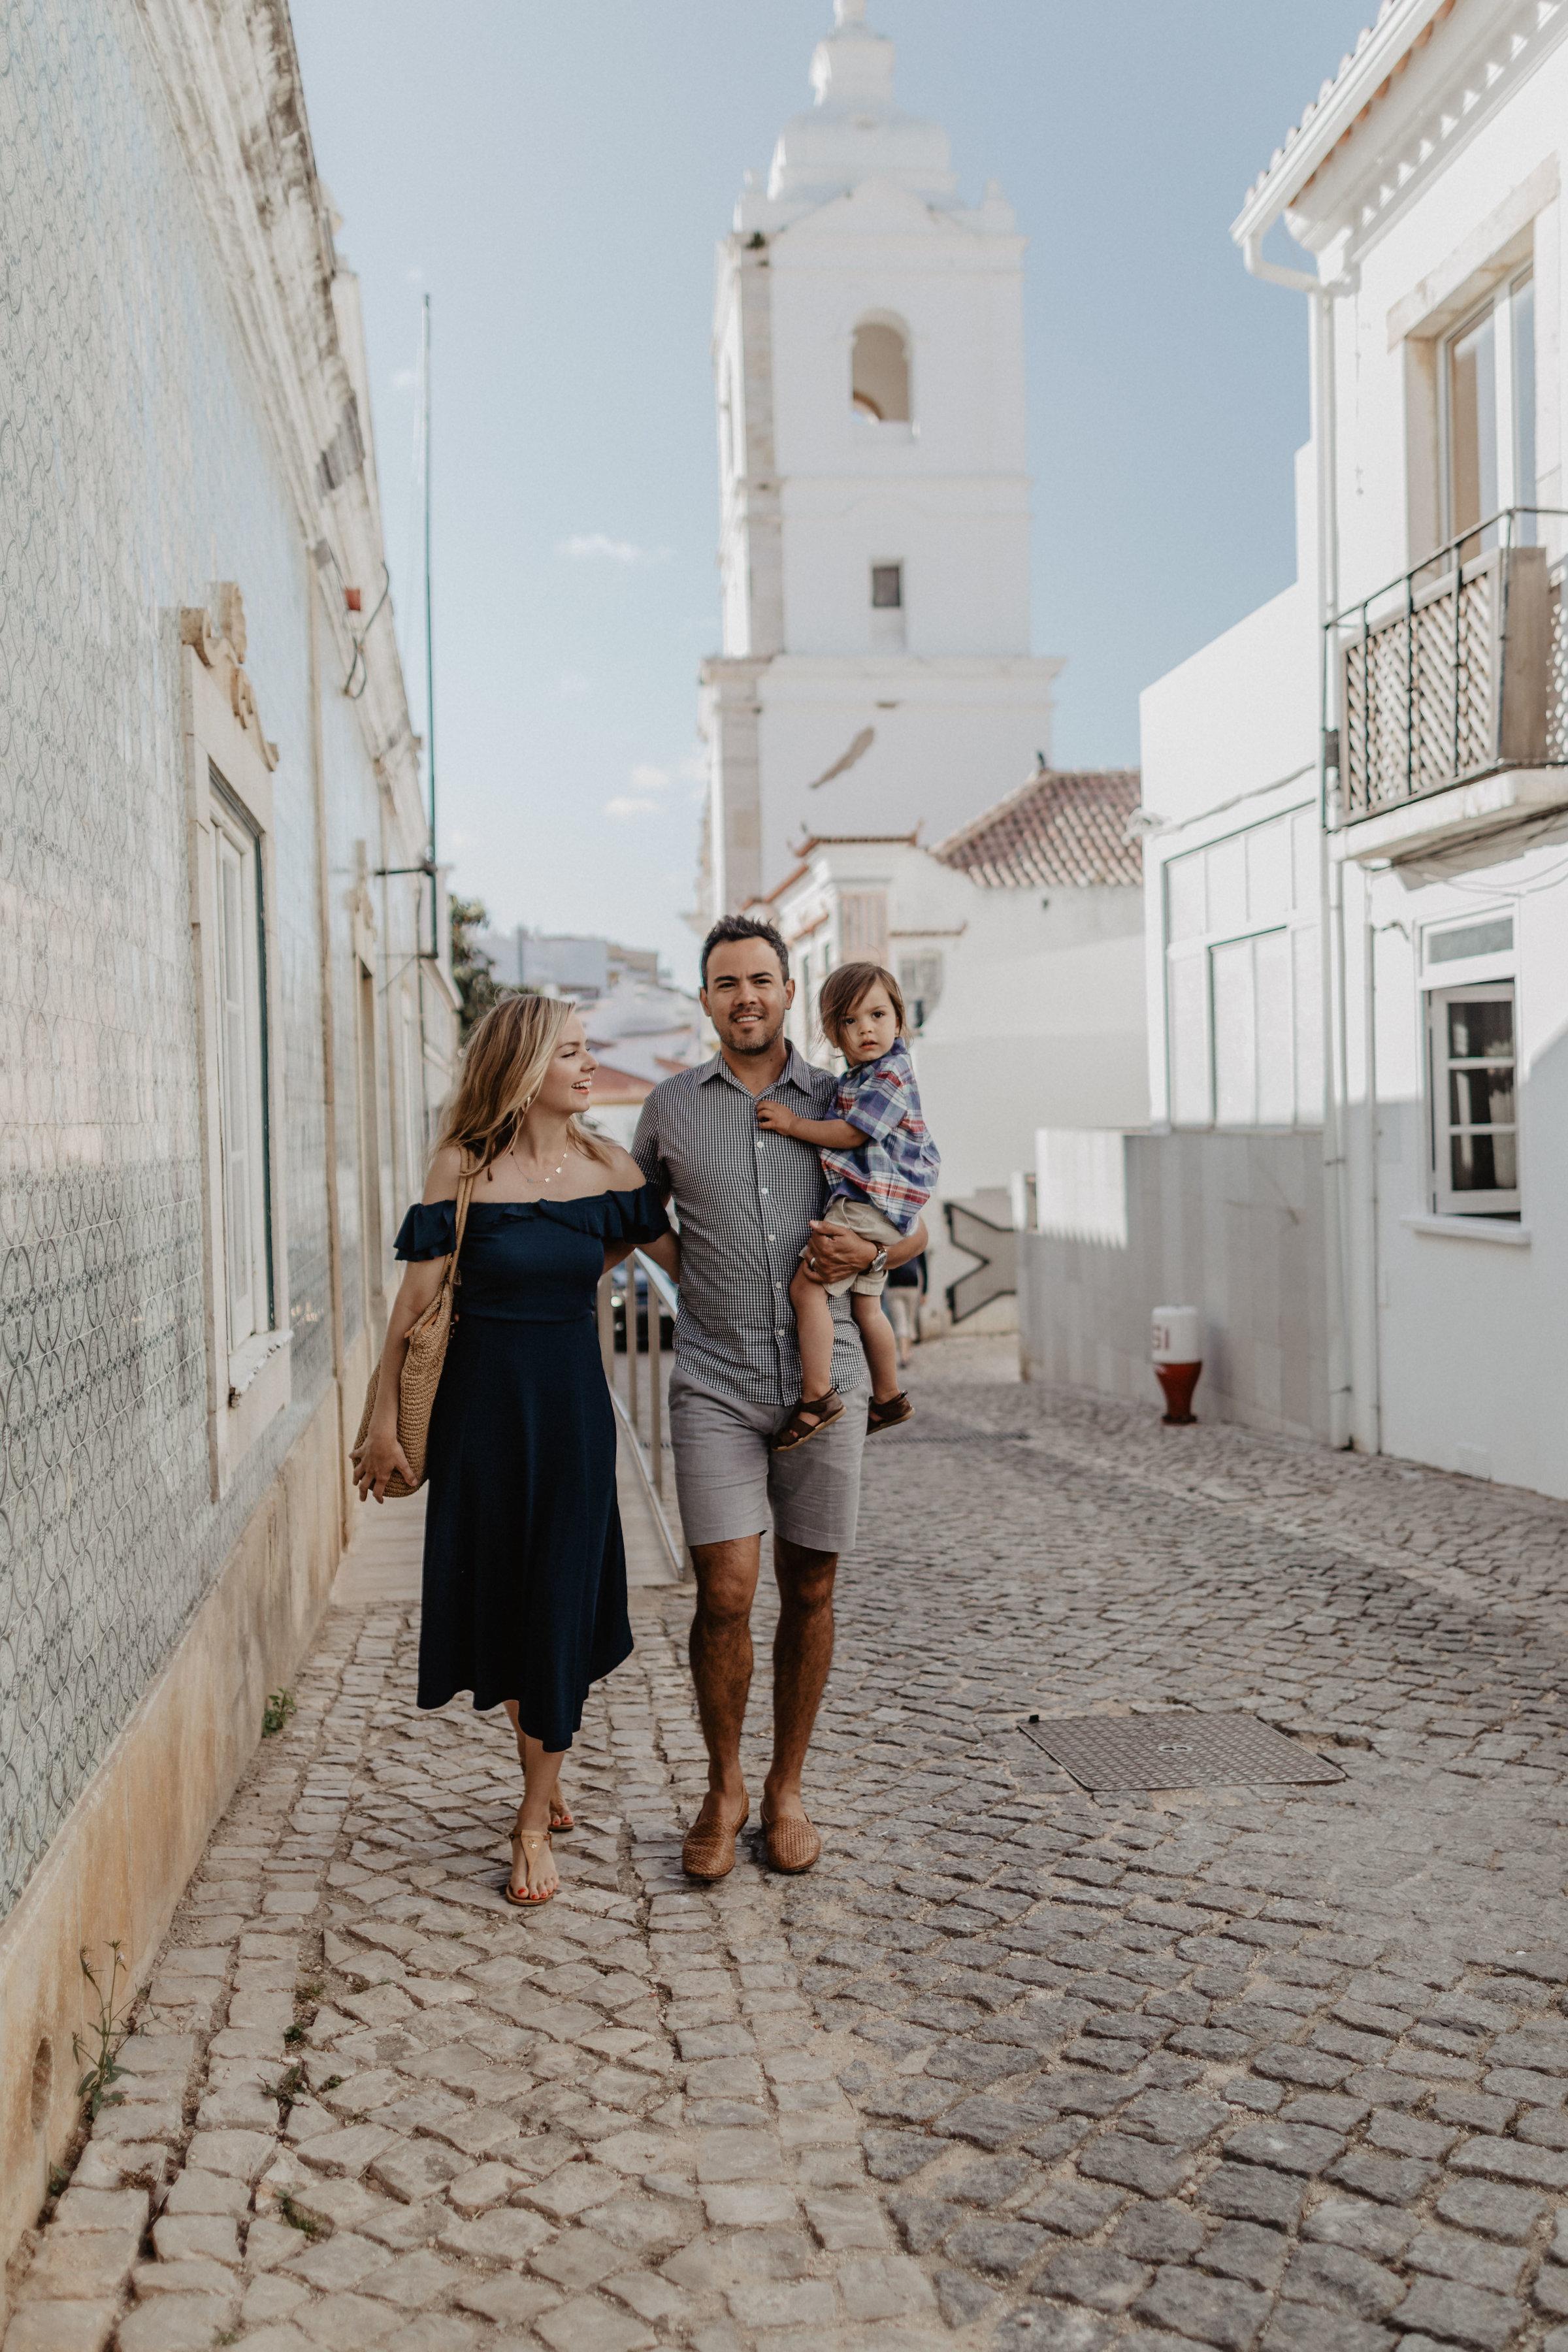 Lapela-Family-photography-Lagos-Algarve4.jpg